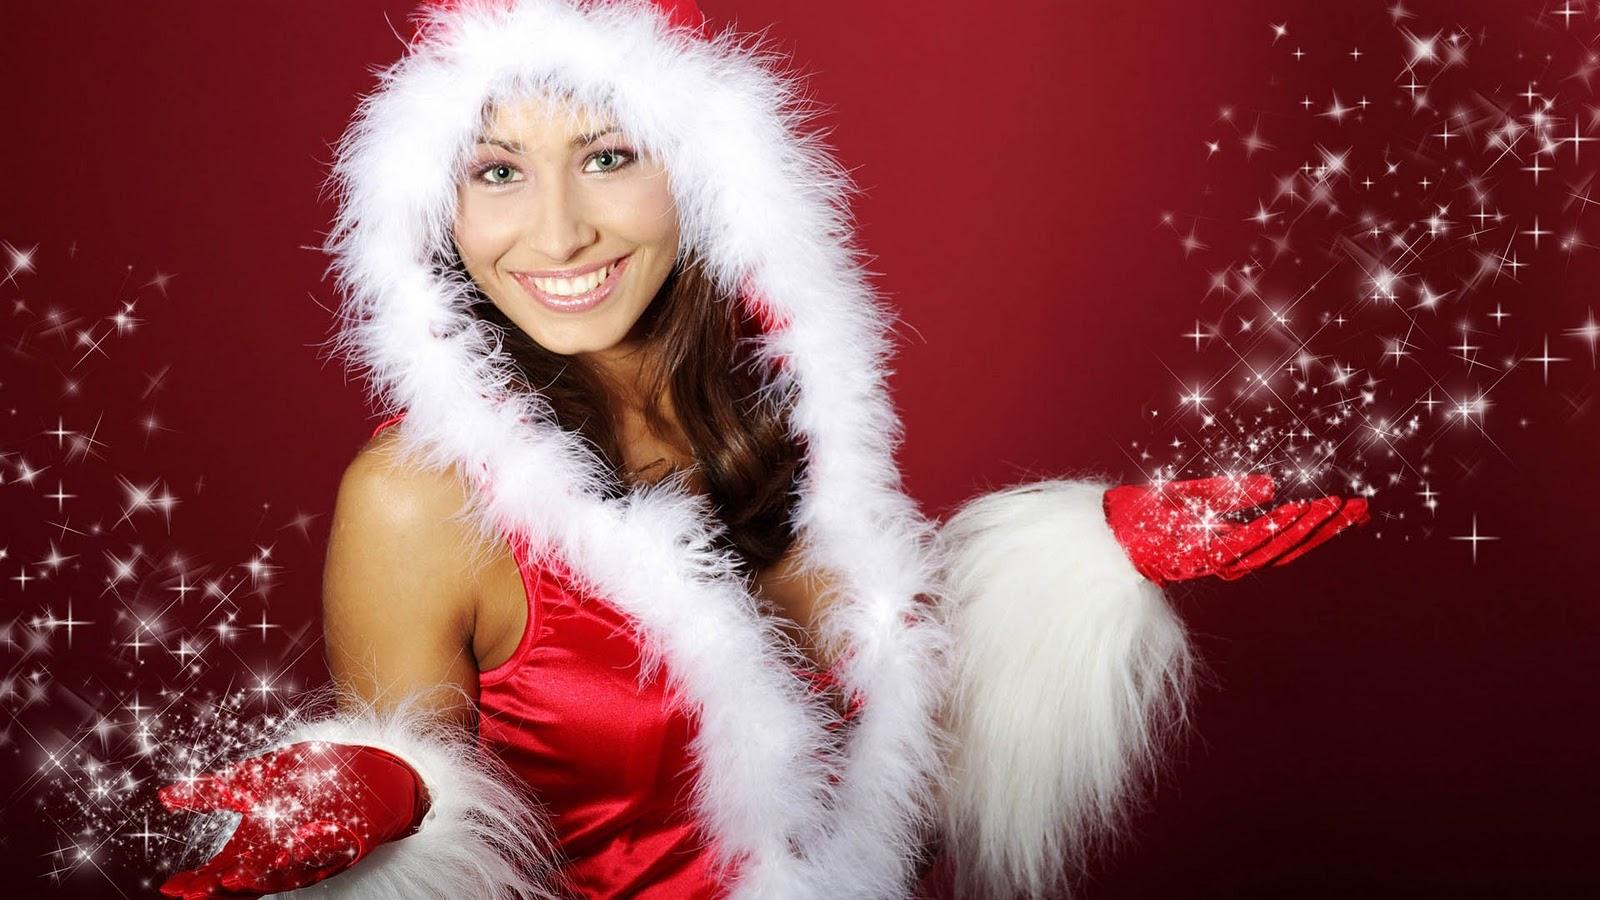 http://4.bp.blogspot.com/-WgVgD-2pazs/TsTDRr7SAxI/AAAAAAAAD0s/XuWTf2npawA/s1600/Christmas-desktop-Wallpapers-HD-photo-images-7.jpg